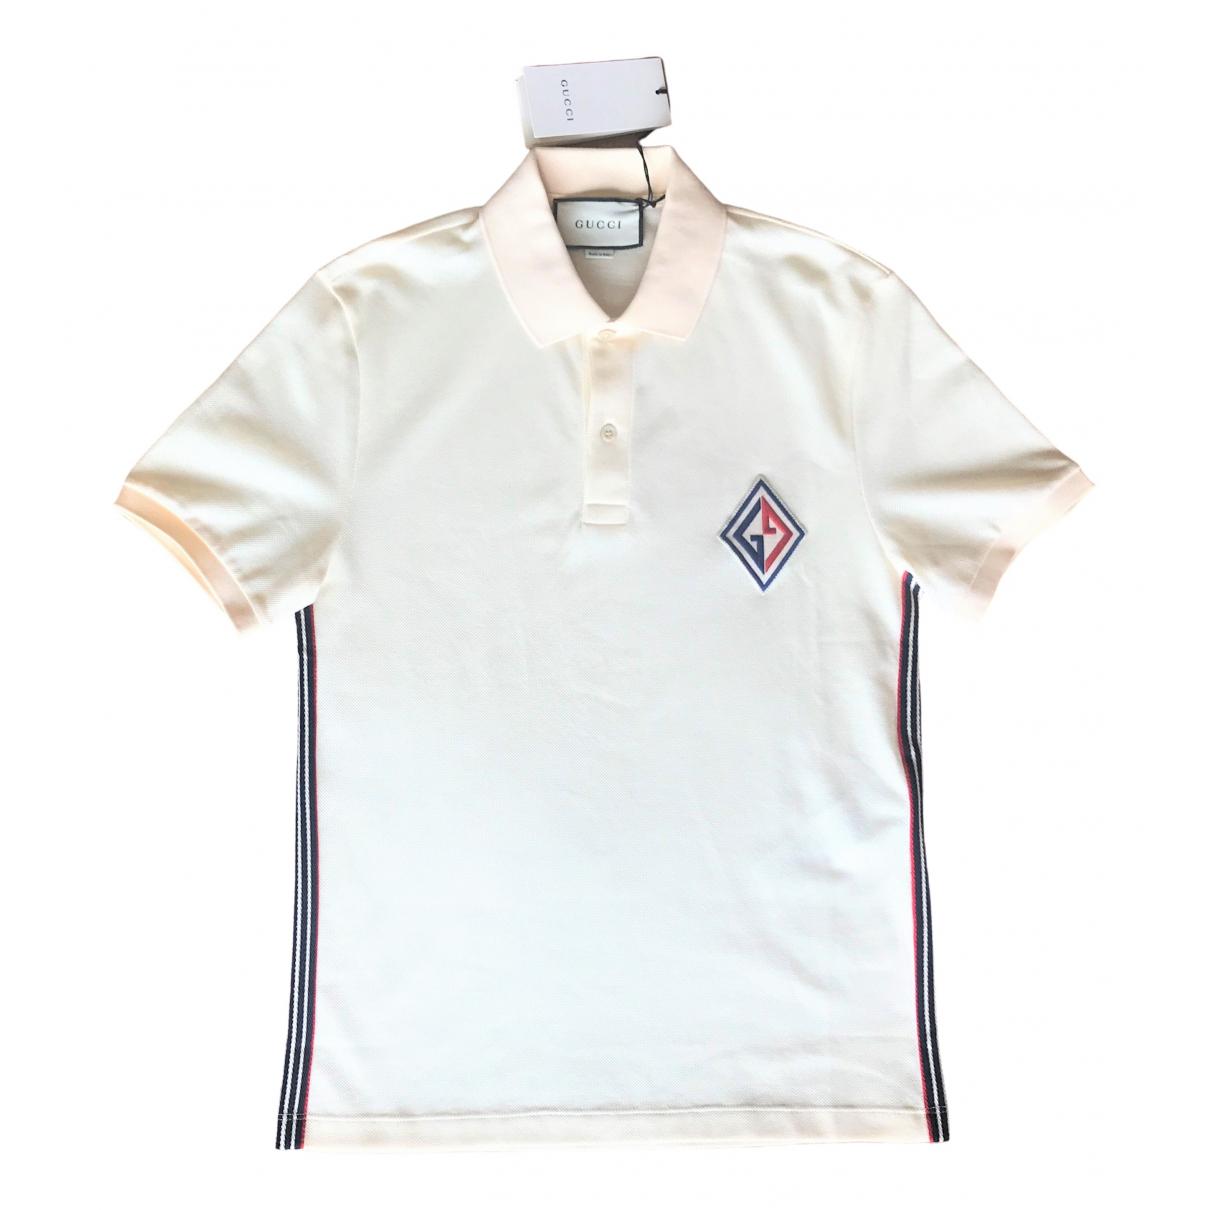 Gucci \N Ecru Cotton T-shirts for Men S International